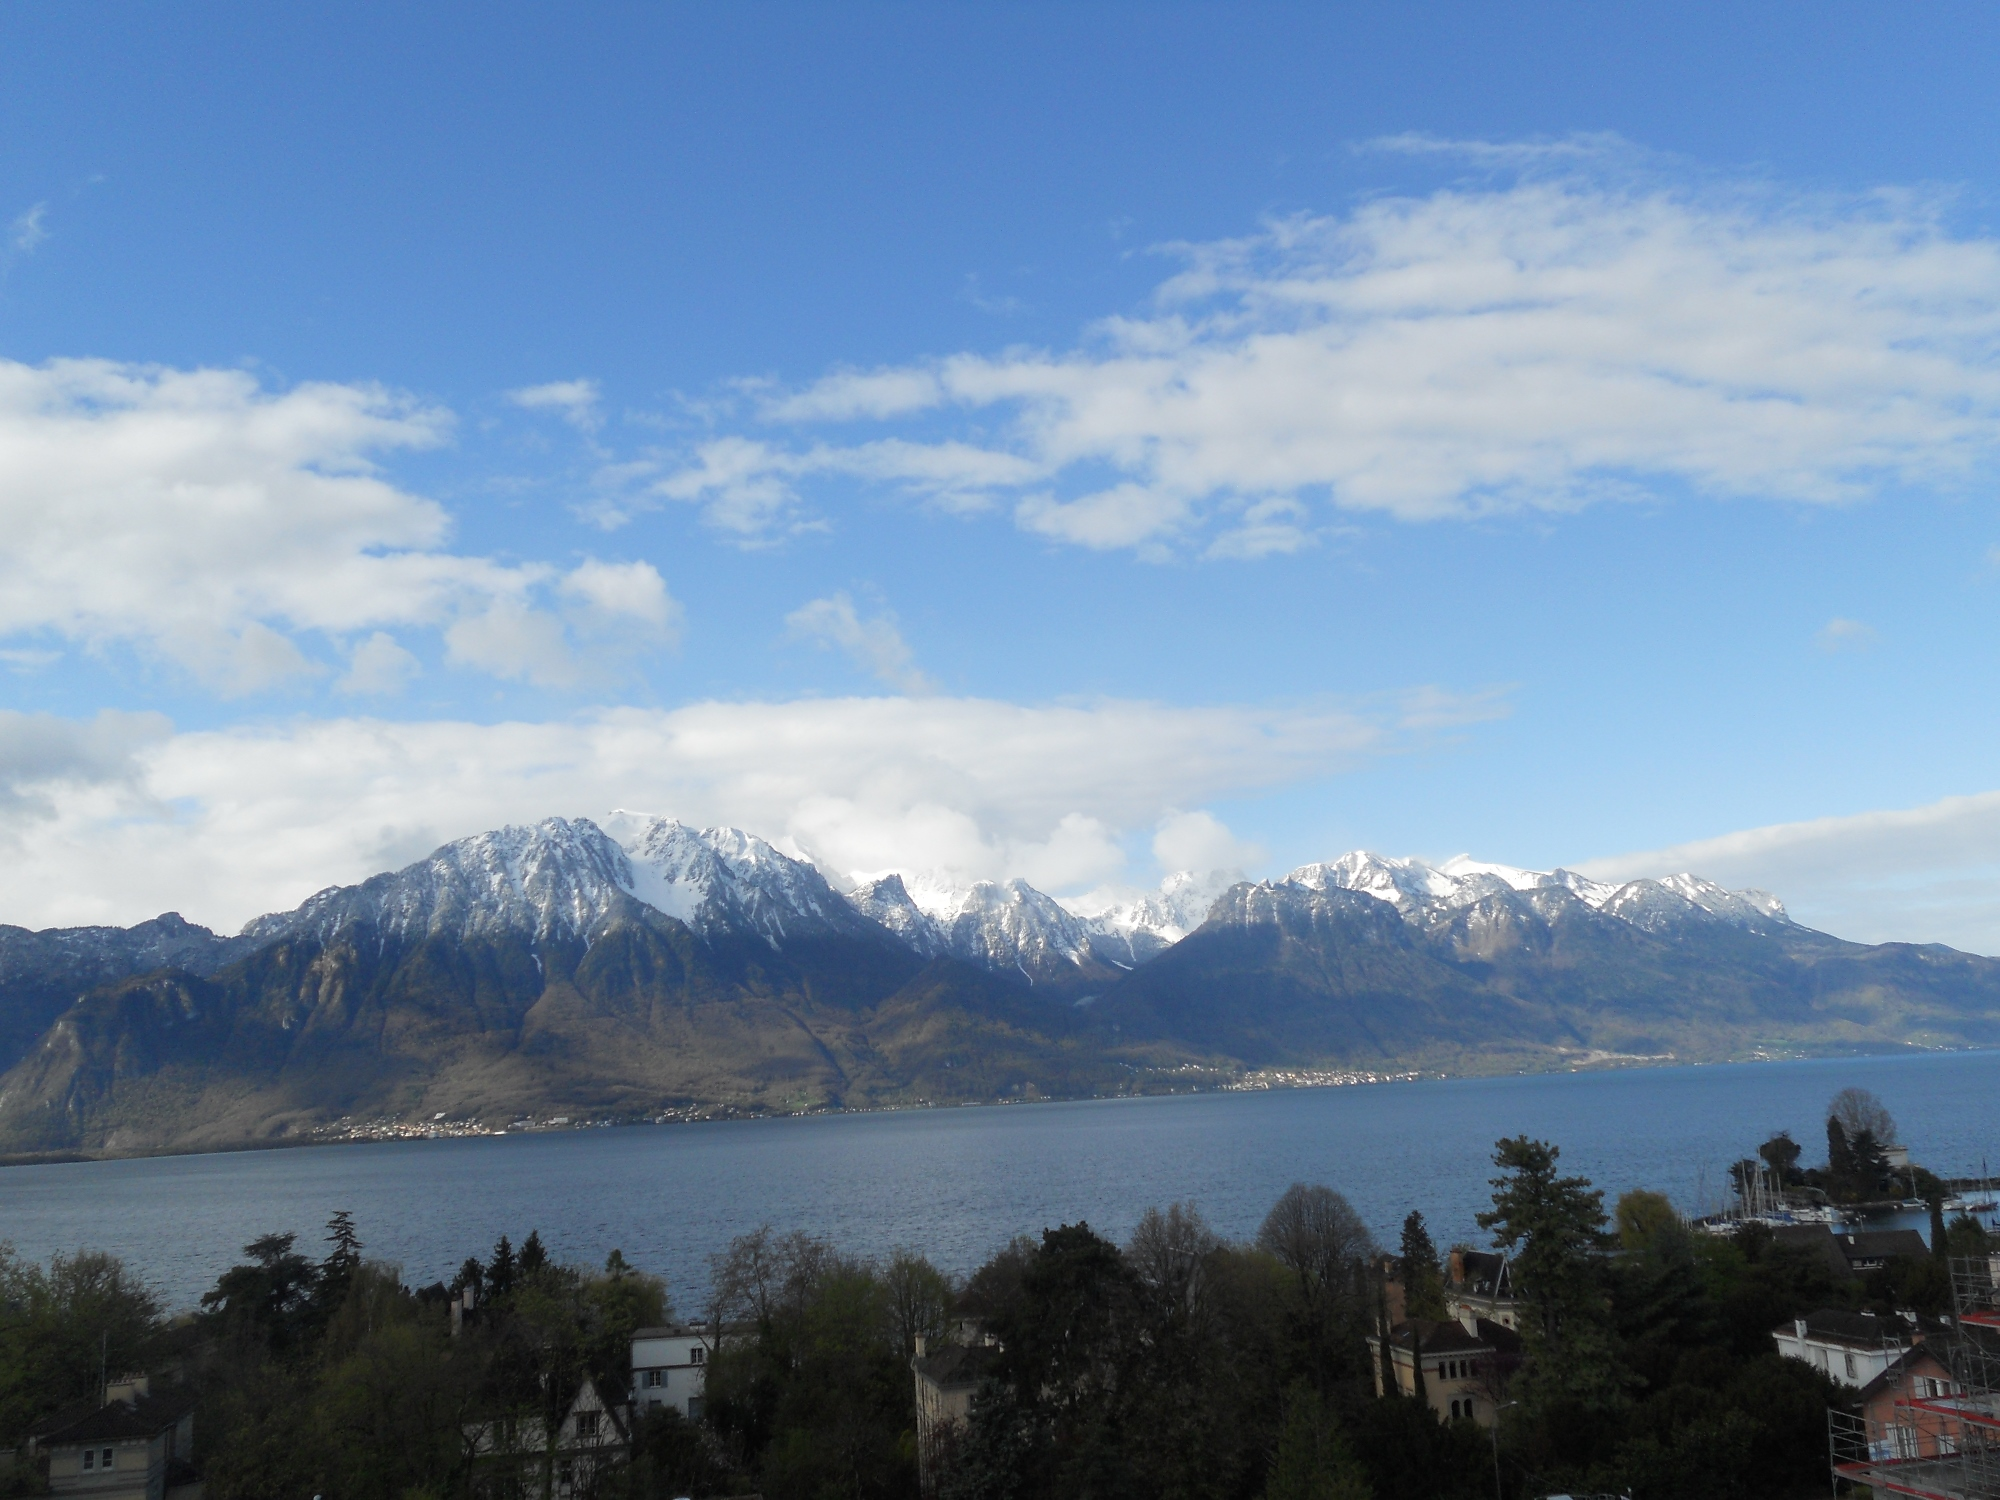 Studio 102, Montreux-Clarens (Riviera suisse) 1-2 persons